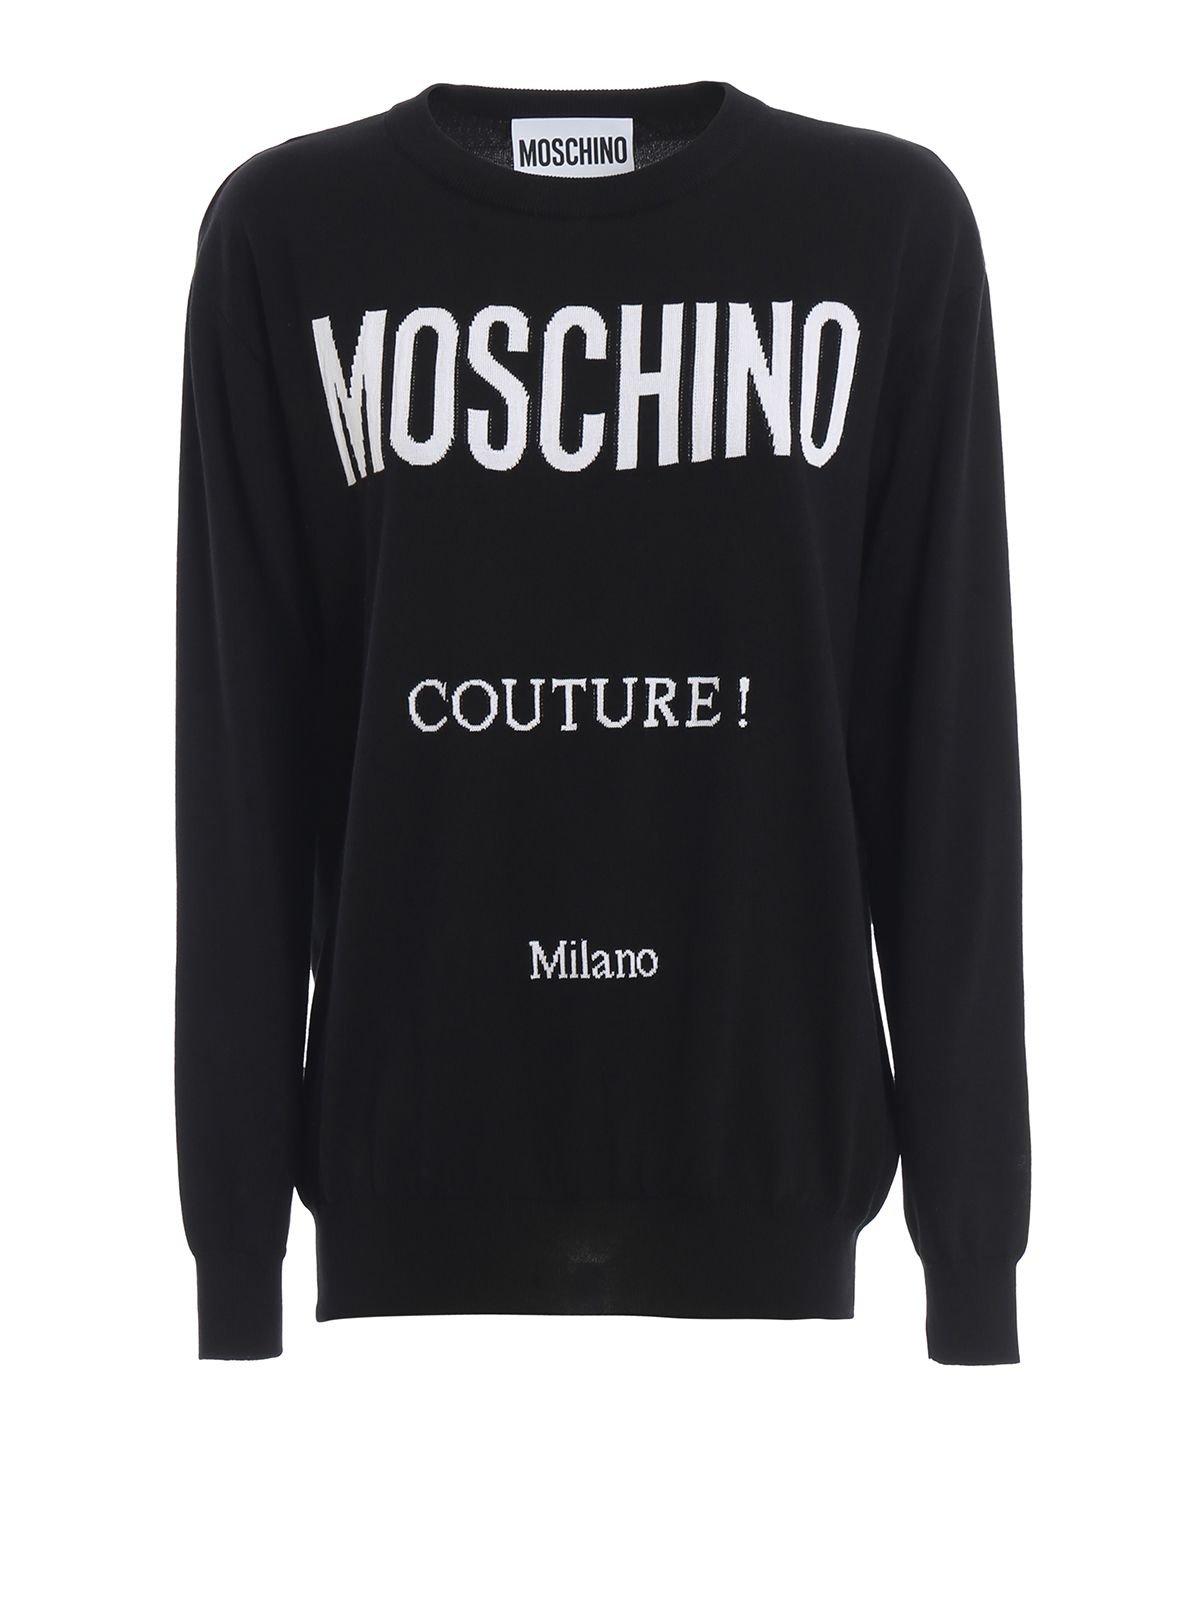 Moschino Logo Intarsia Black Cotton Sweater